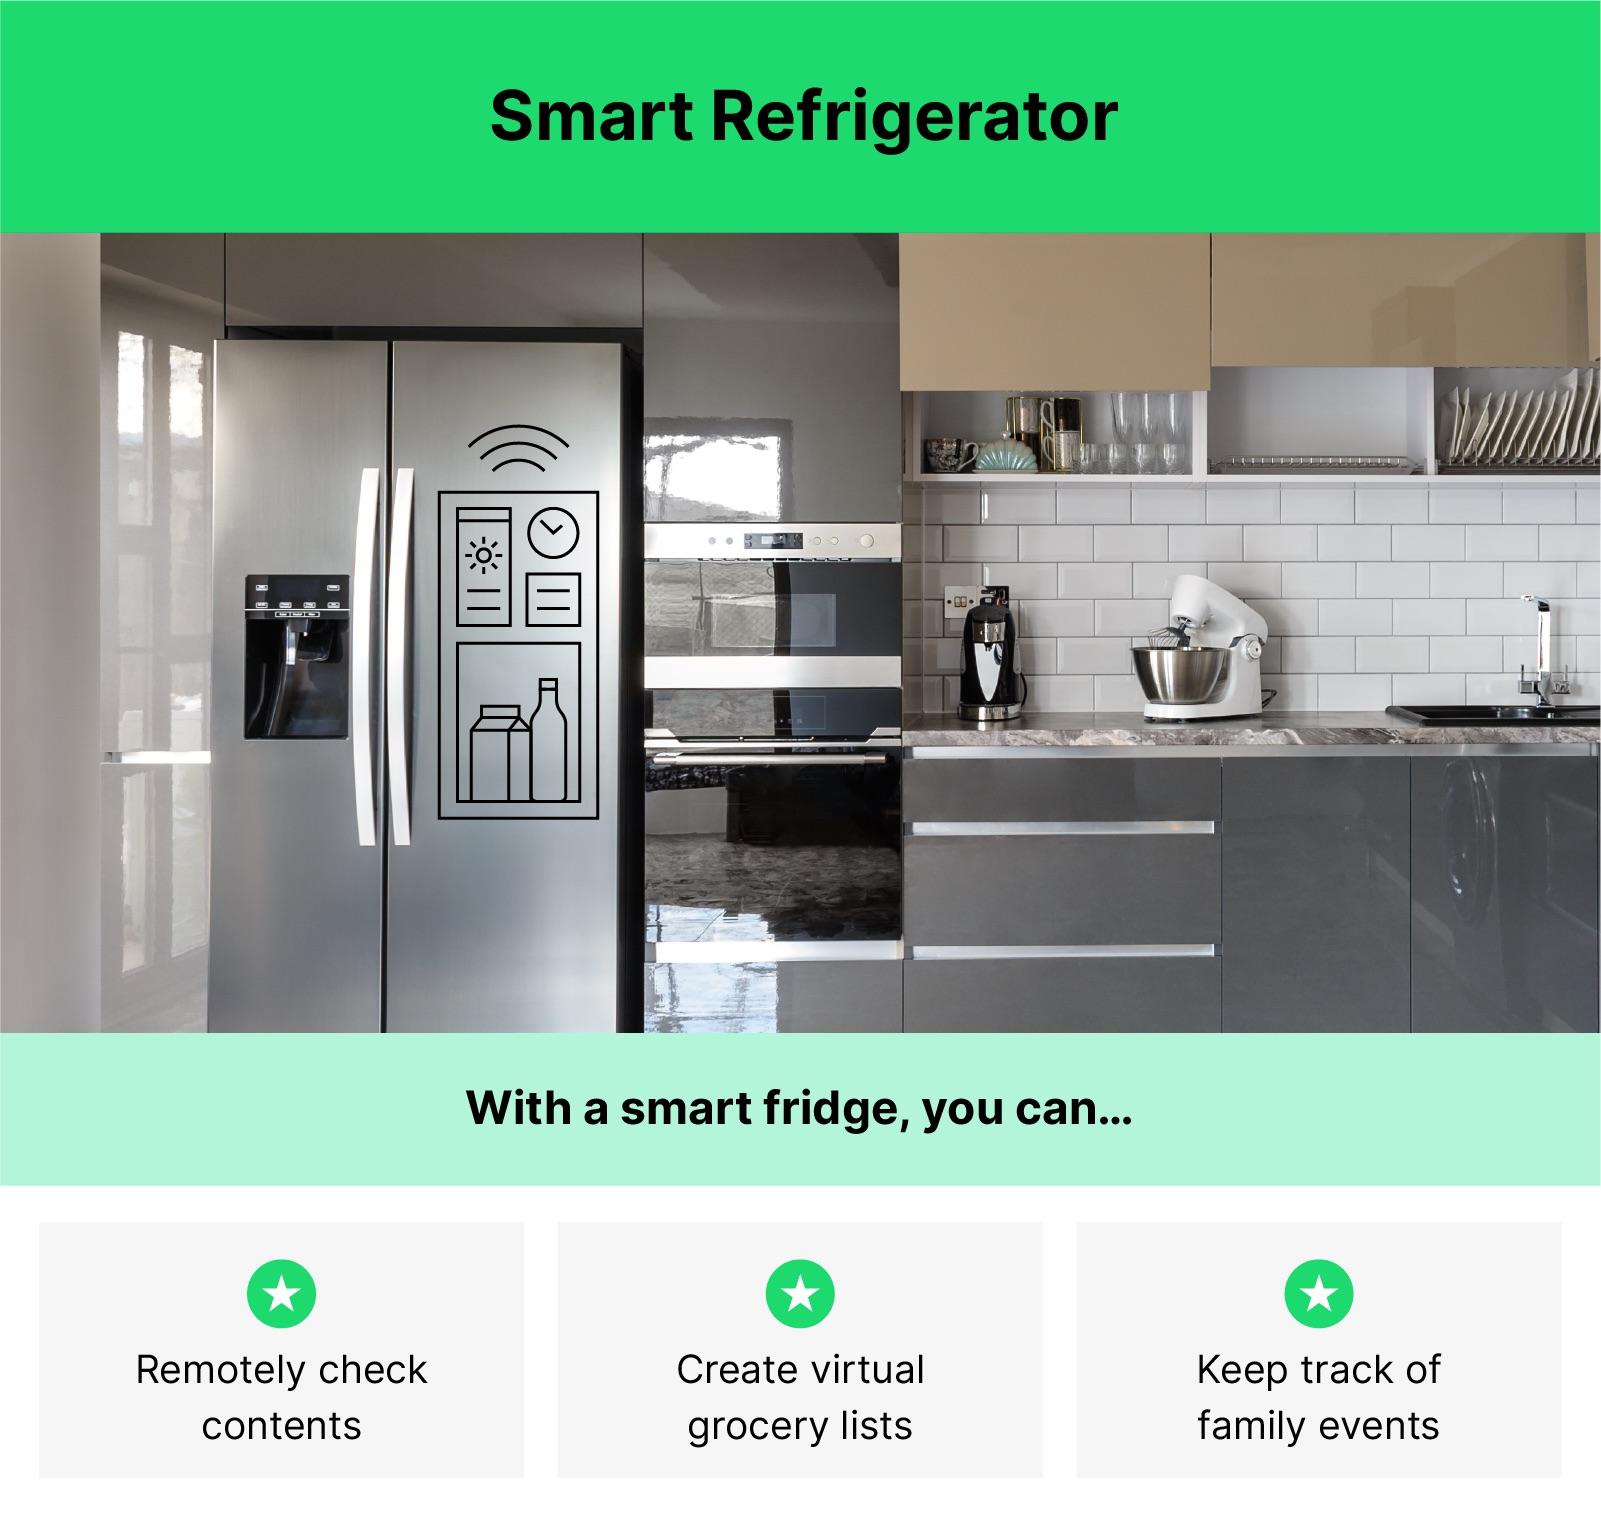 Smart Refrigerator